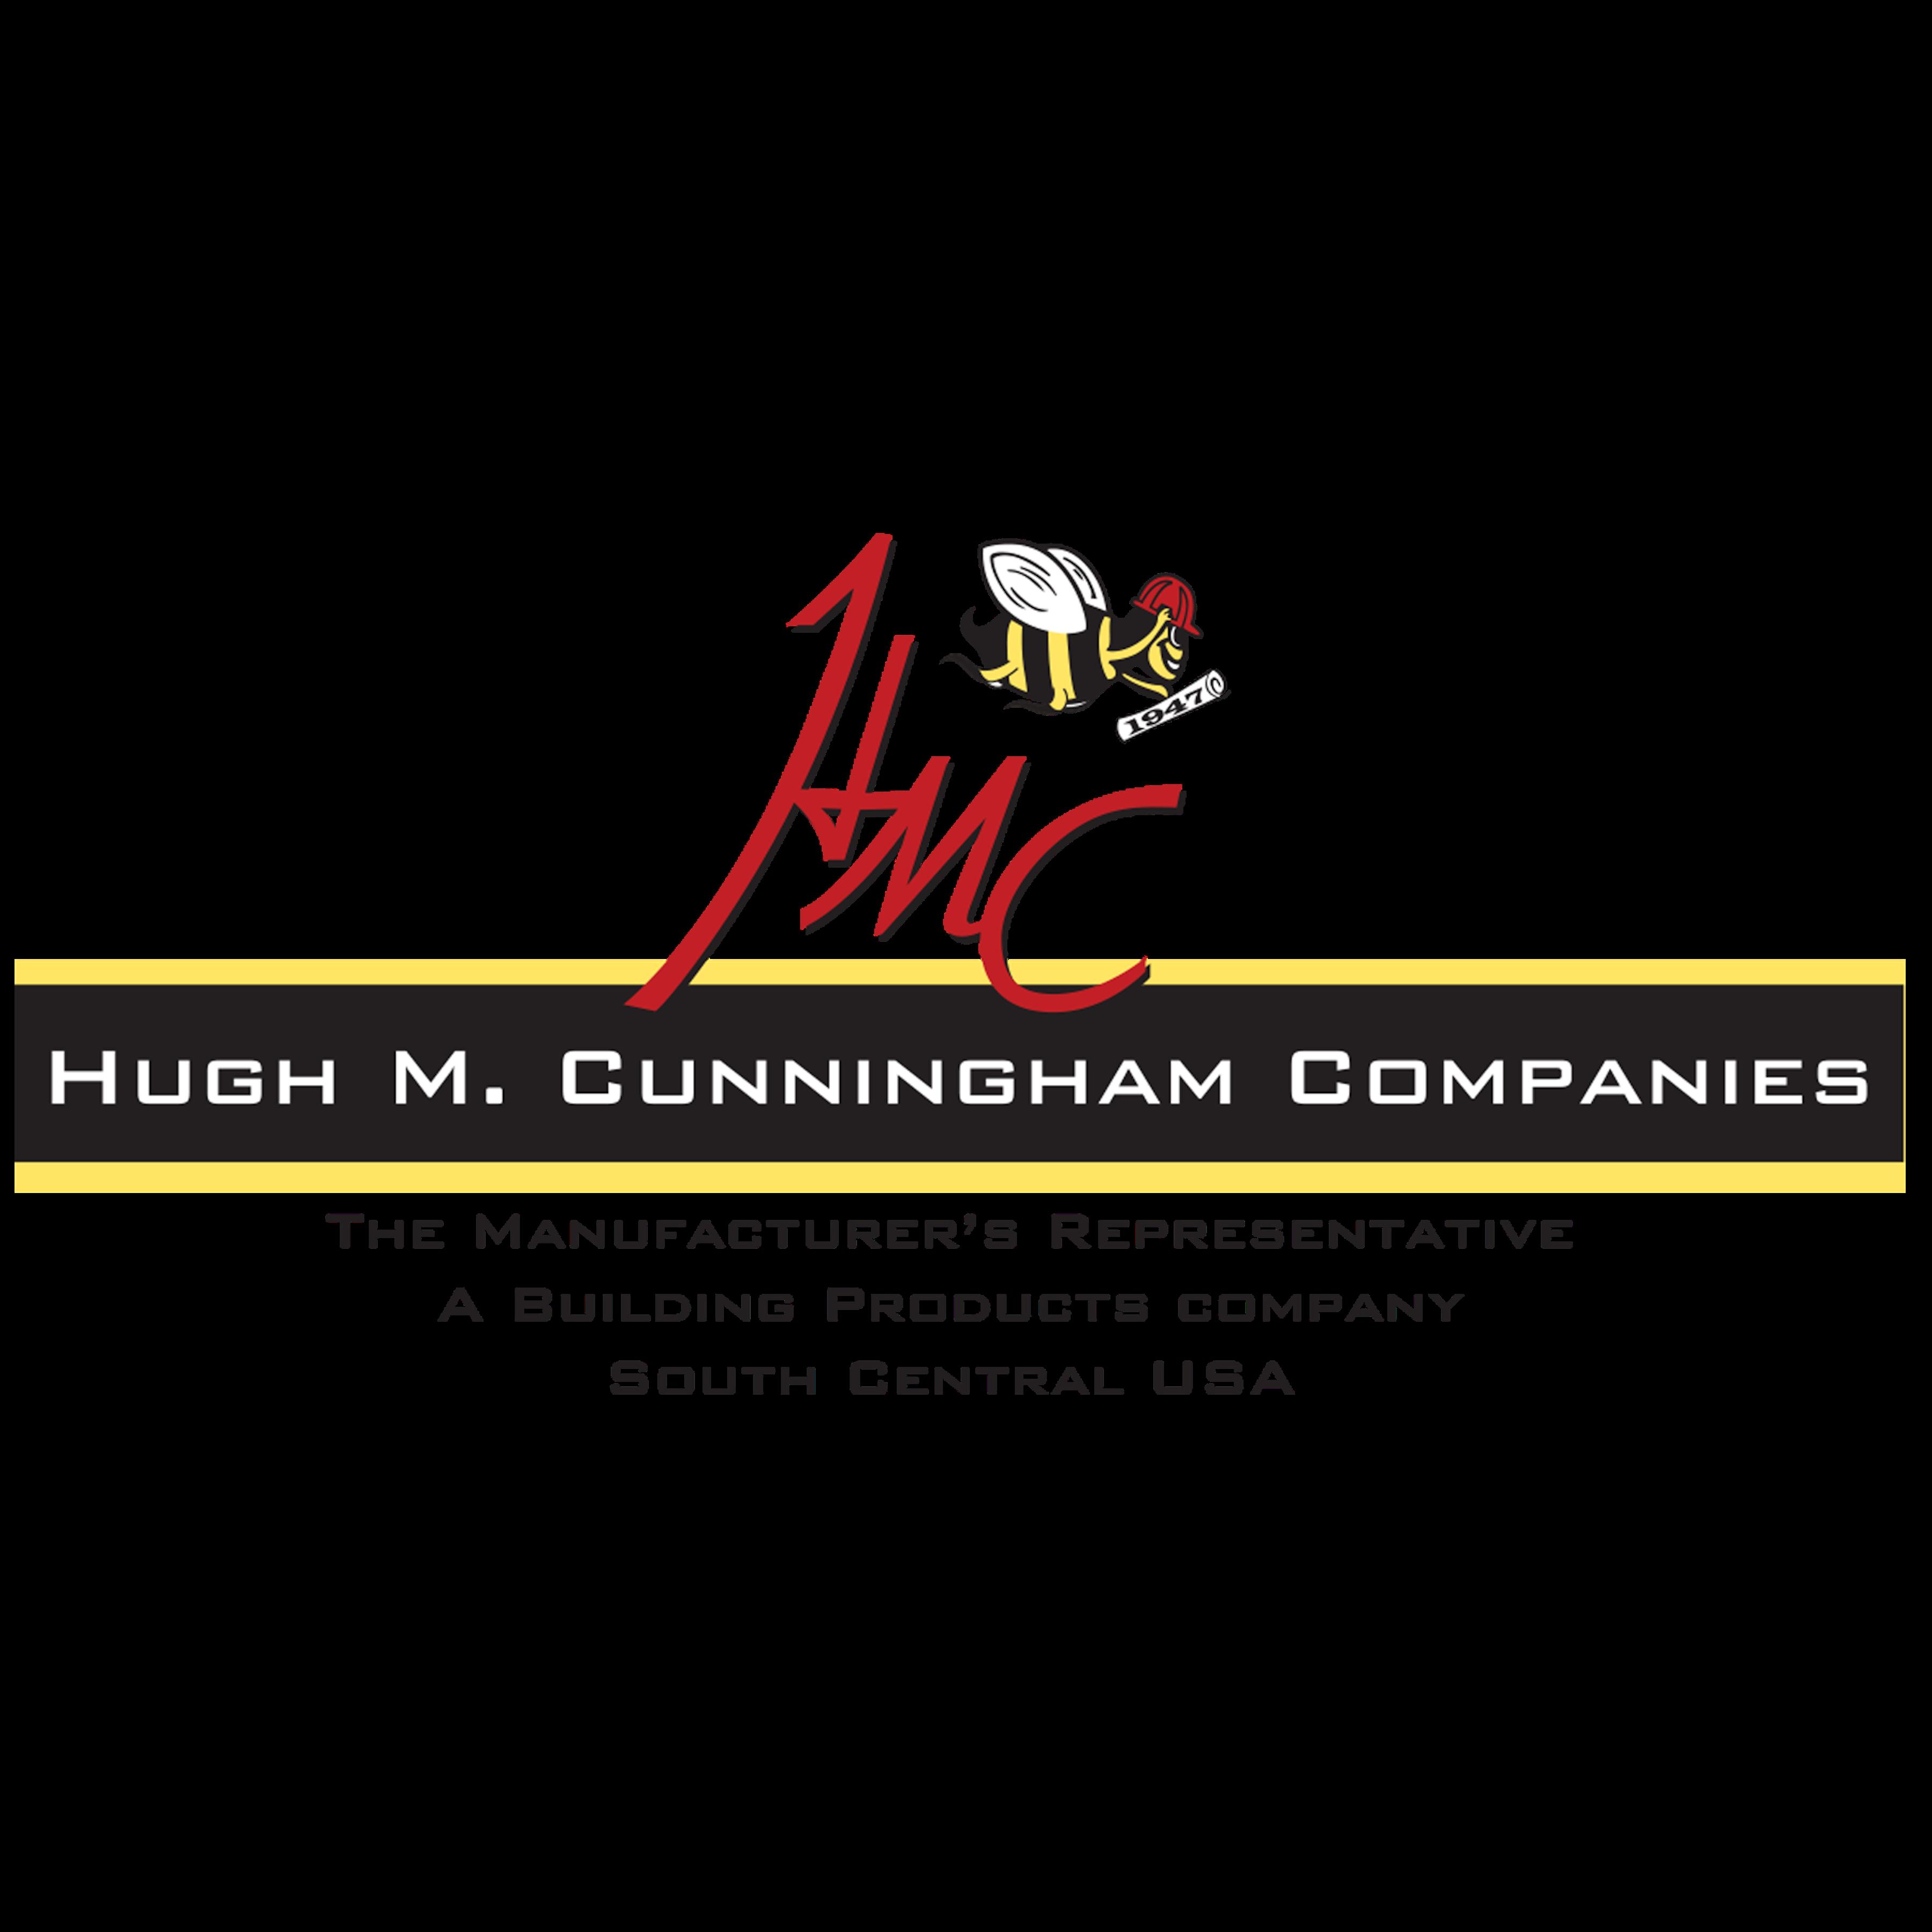 Hugh M. Cunningham